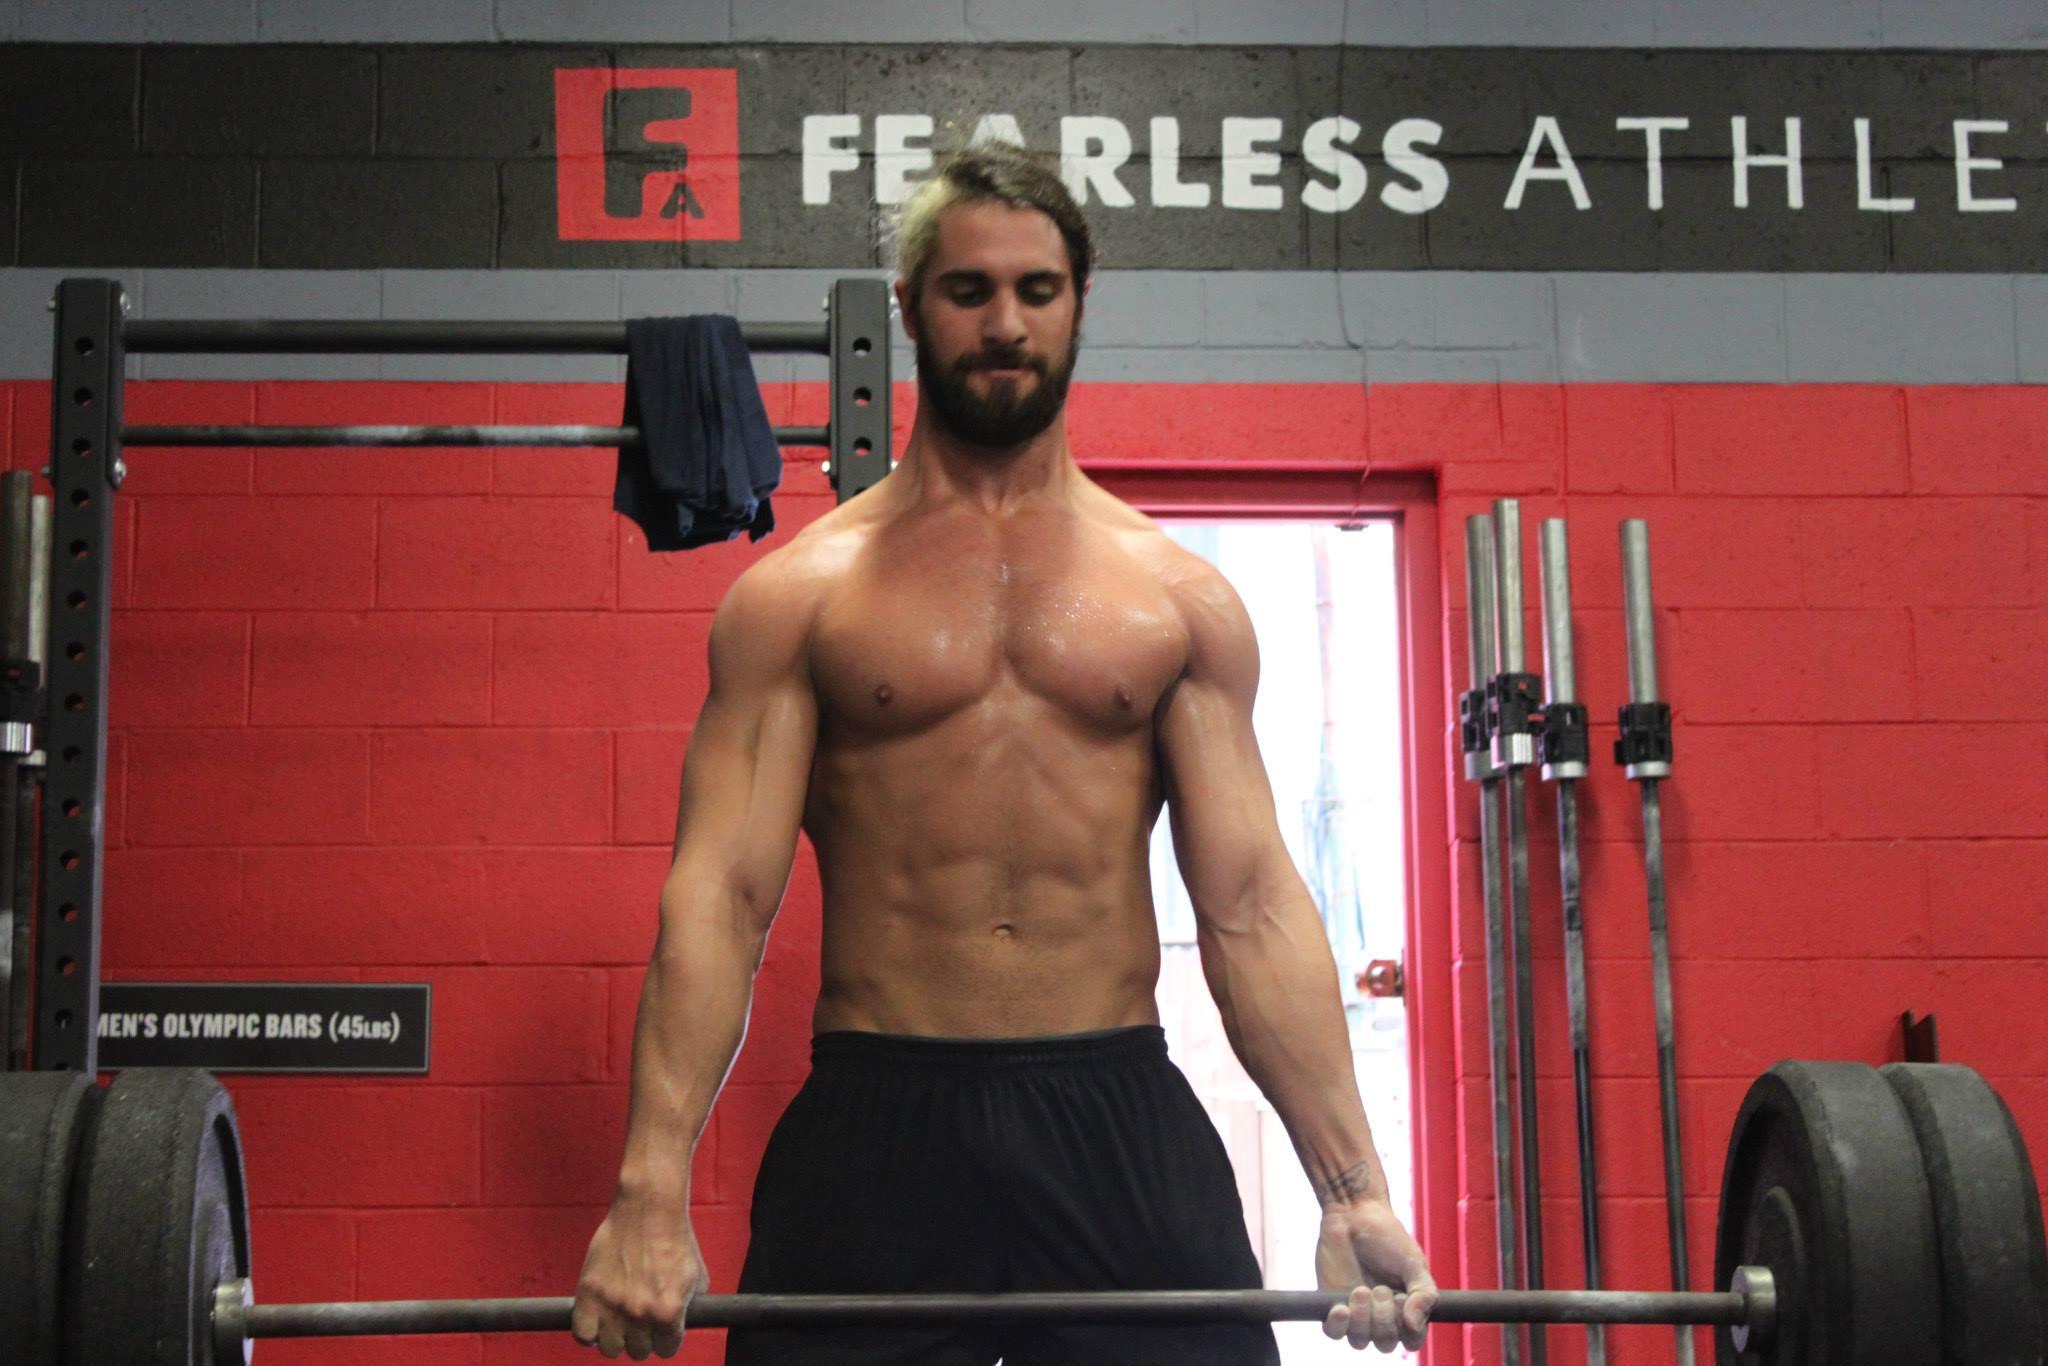 Wrestling man wwe nude, ffm hardcore video